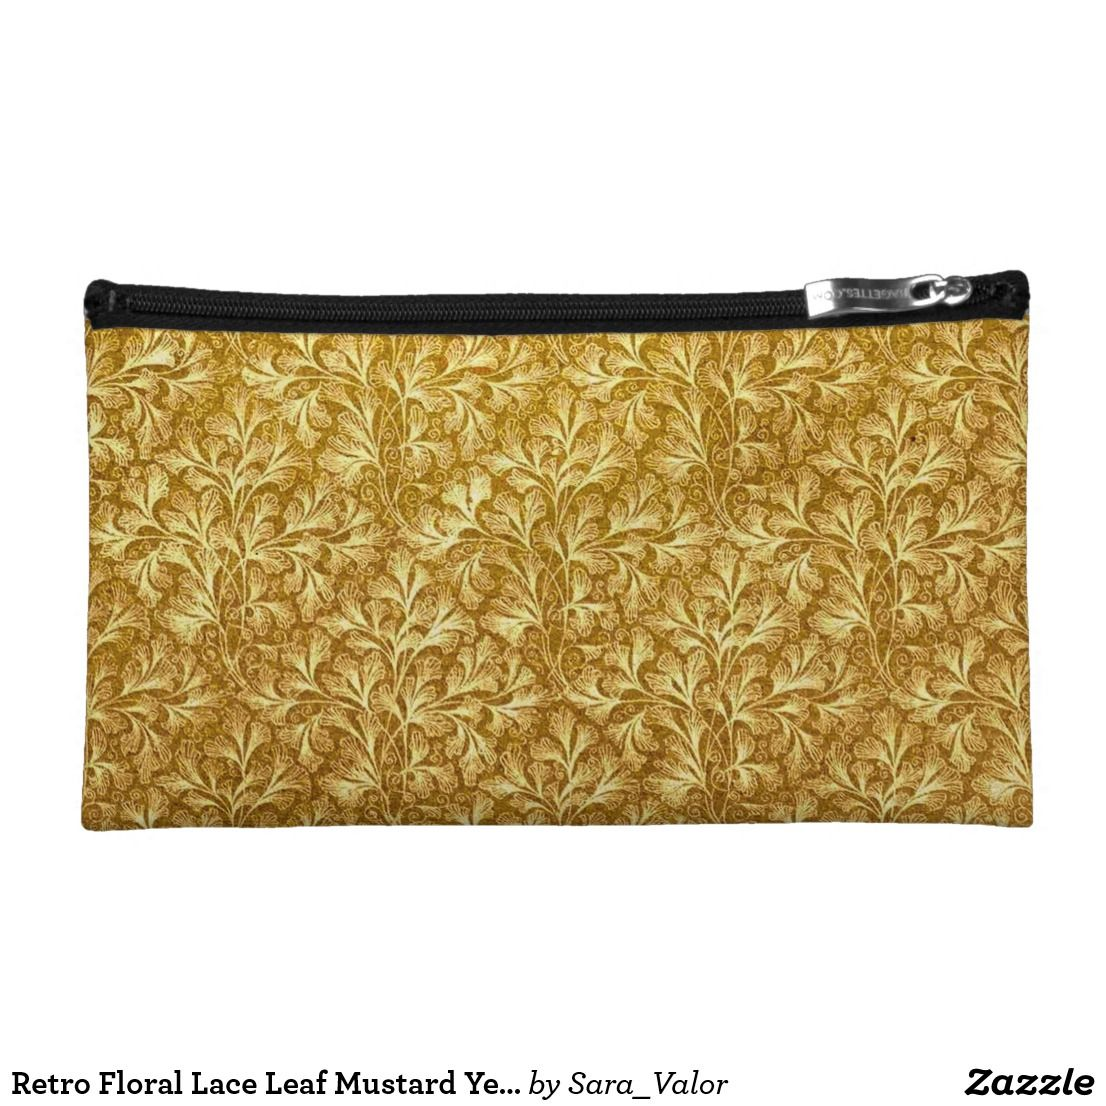 Retro Floral Lace Leaf Mustard Yellow Bagettes Makeup Bag